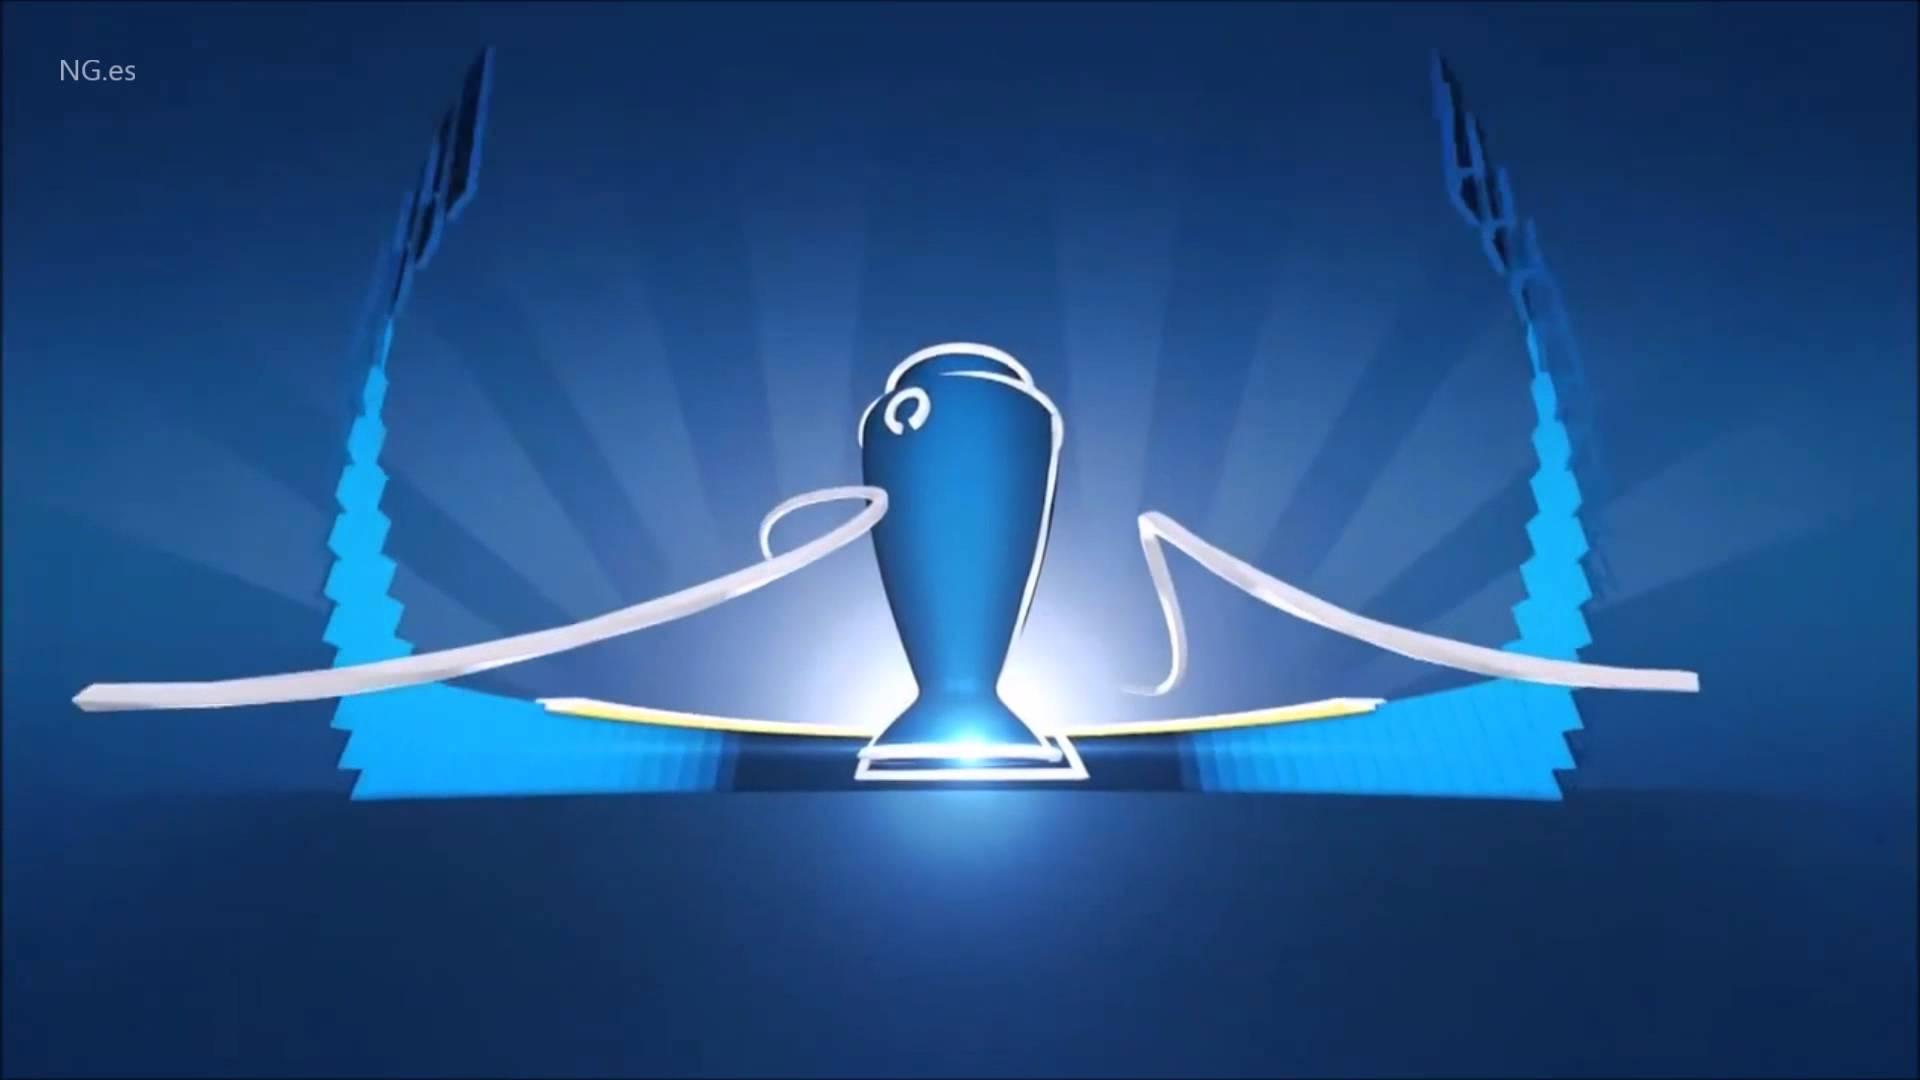 UEFA Champions League Heineken Wallpaper 2016 UEFA 1920x1080